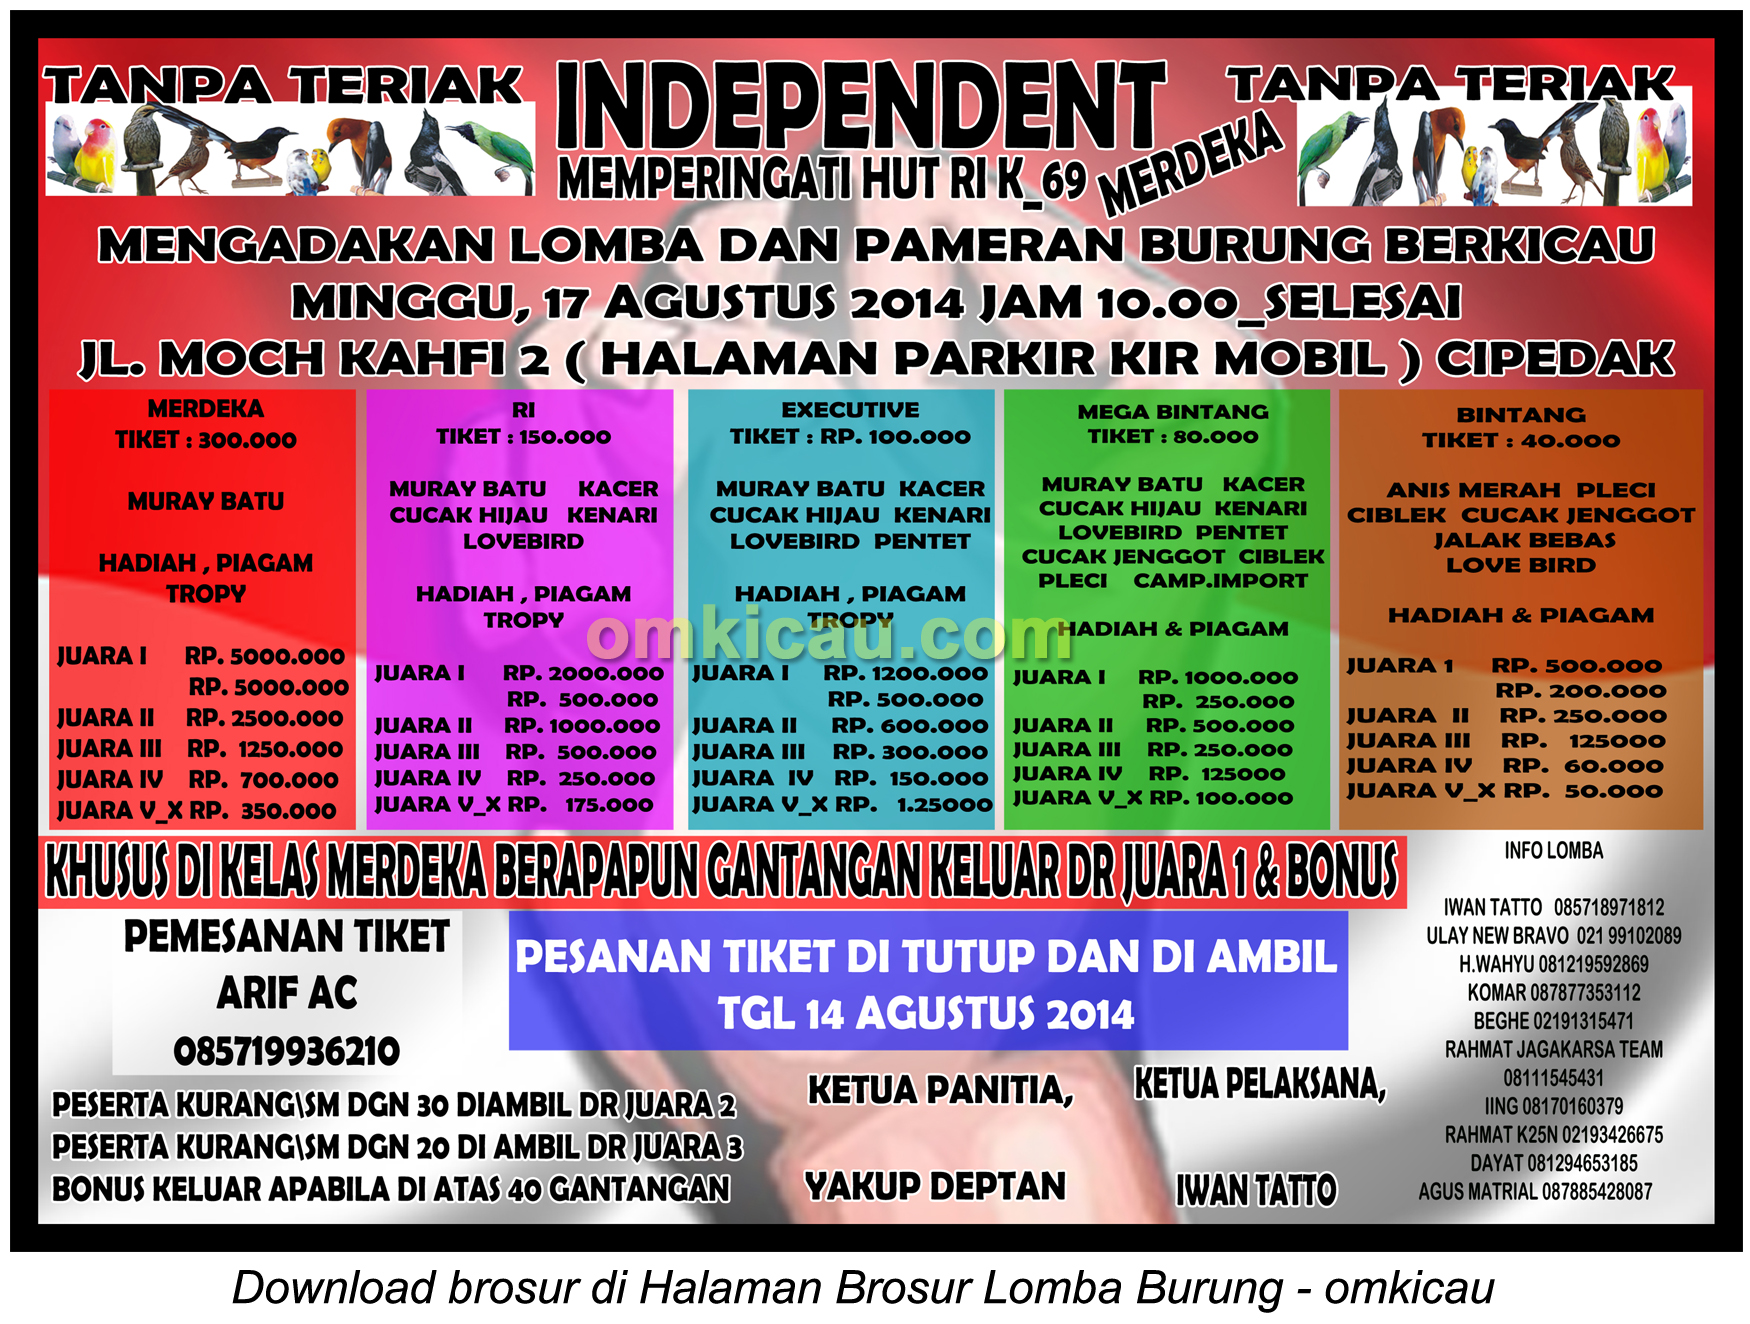 Brosur Lomba Burung 69Th Kemerdekaan RI - Independent Ent, Jakarta Selatan, 17 Agustus 2014